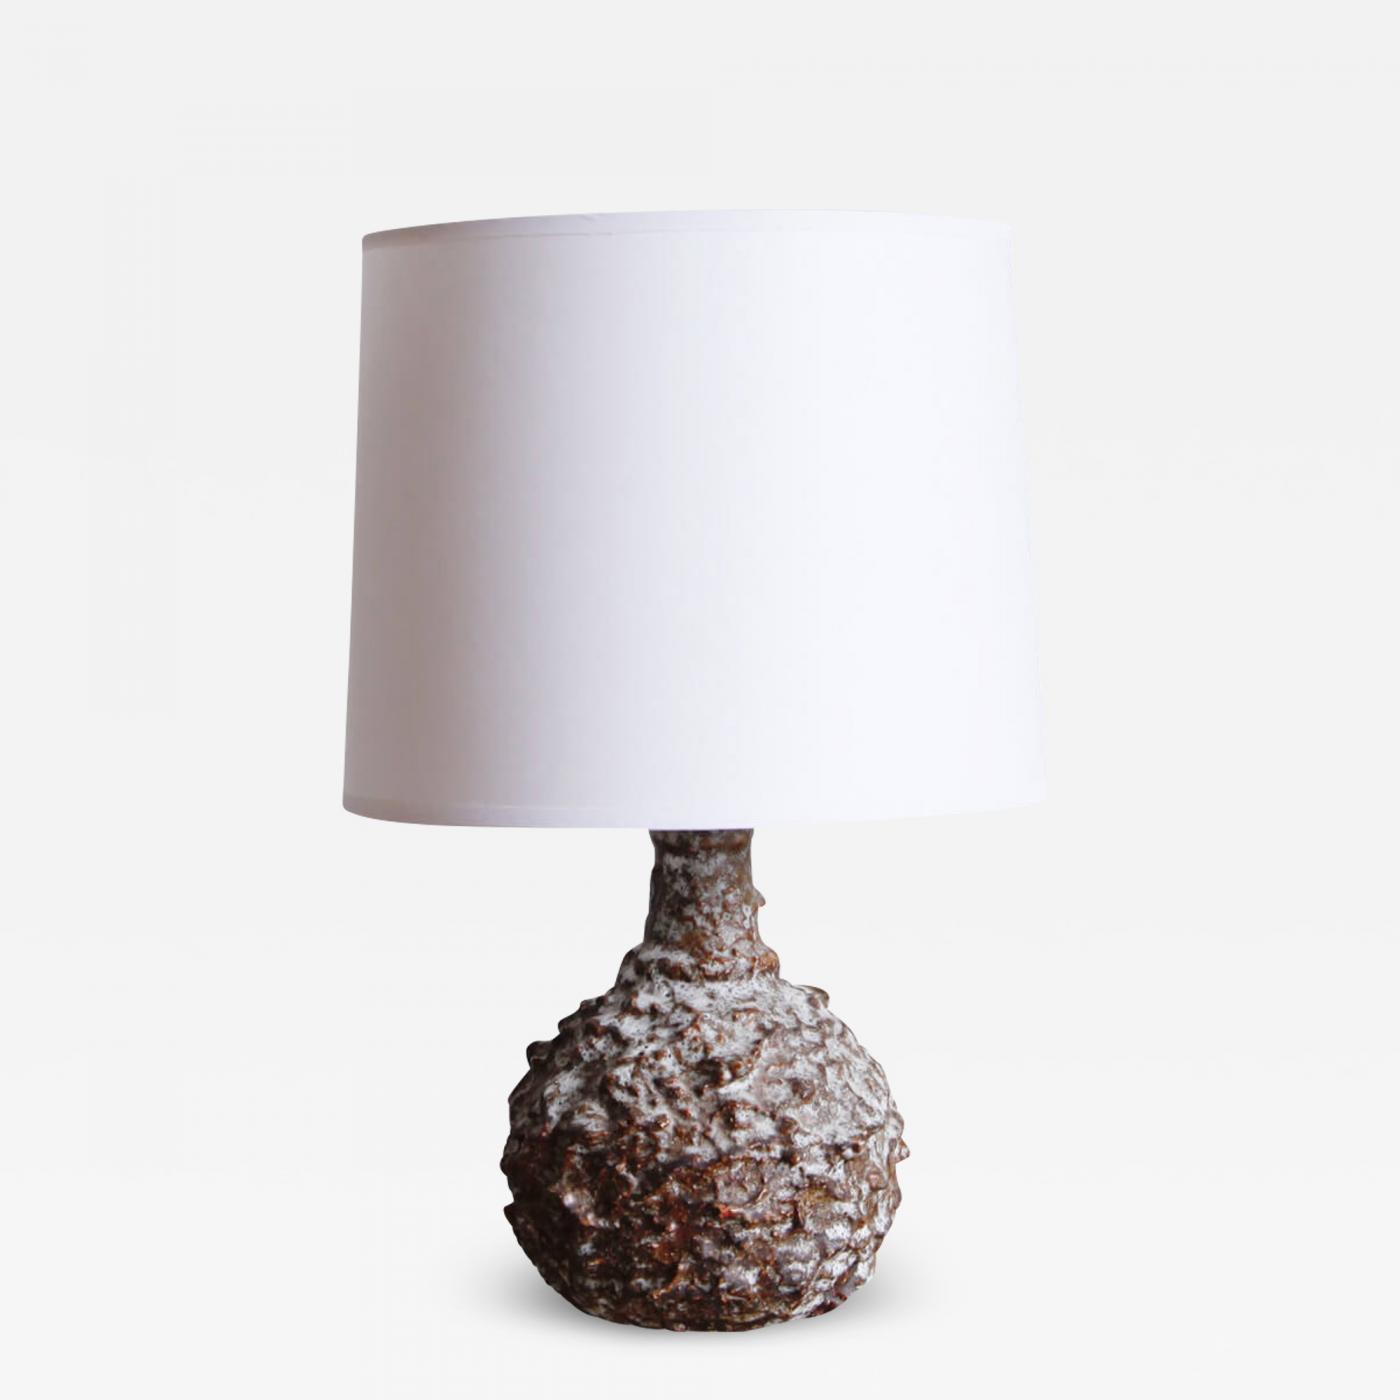 Image of: Danish Modern Glazed Earthenware Desk Lamp